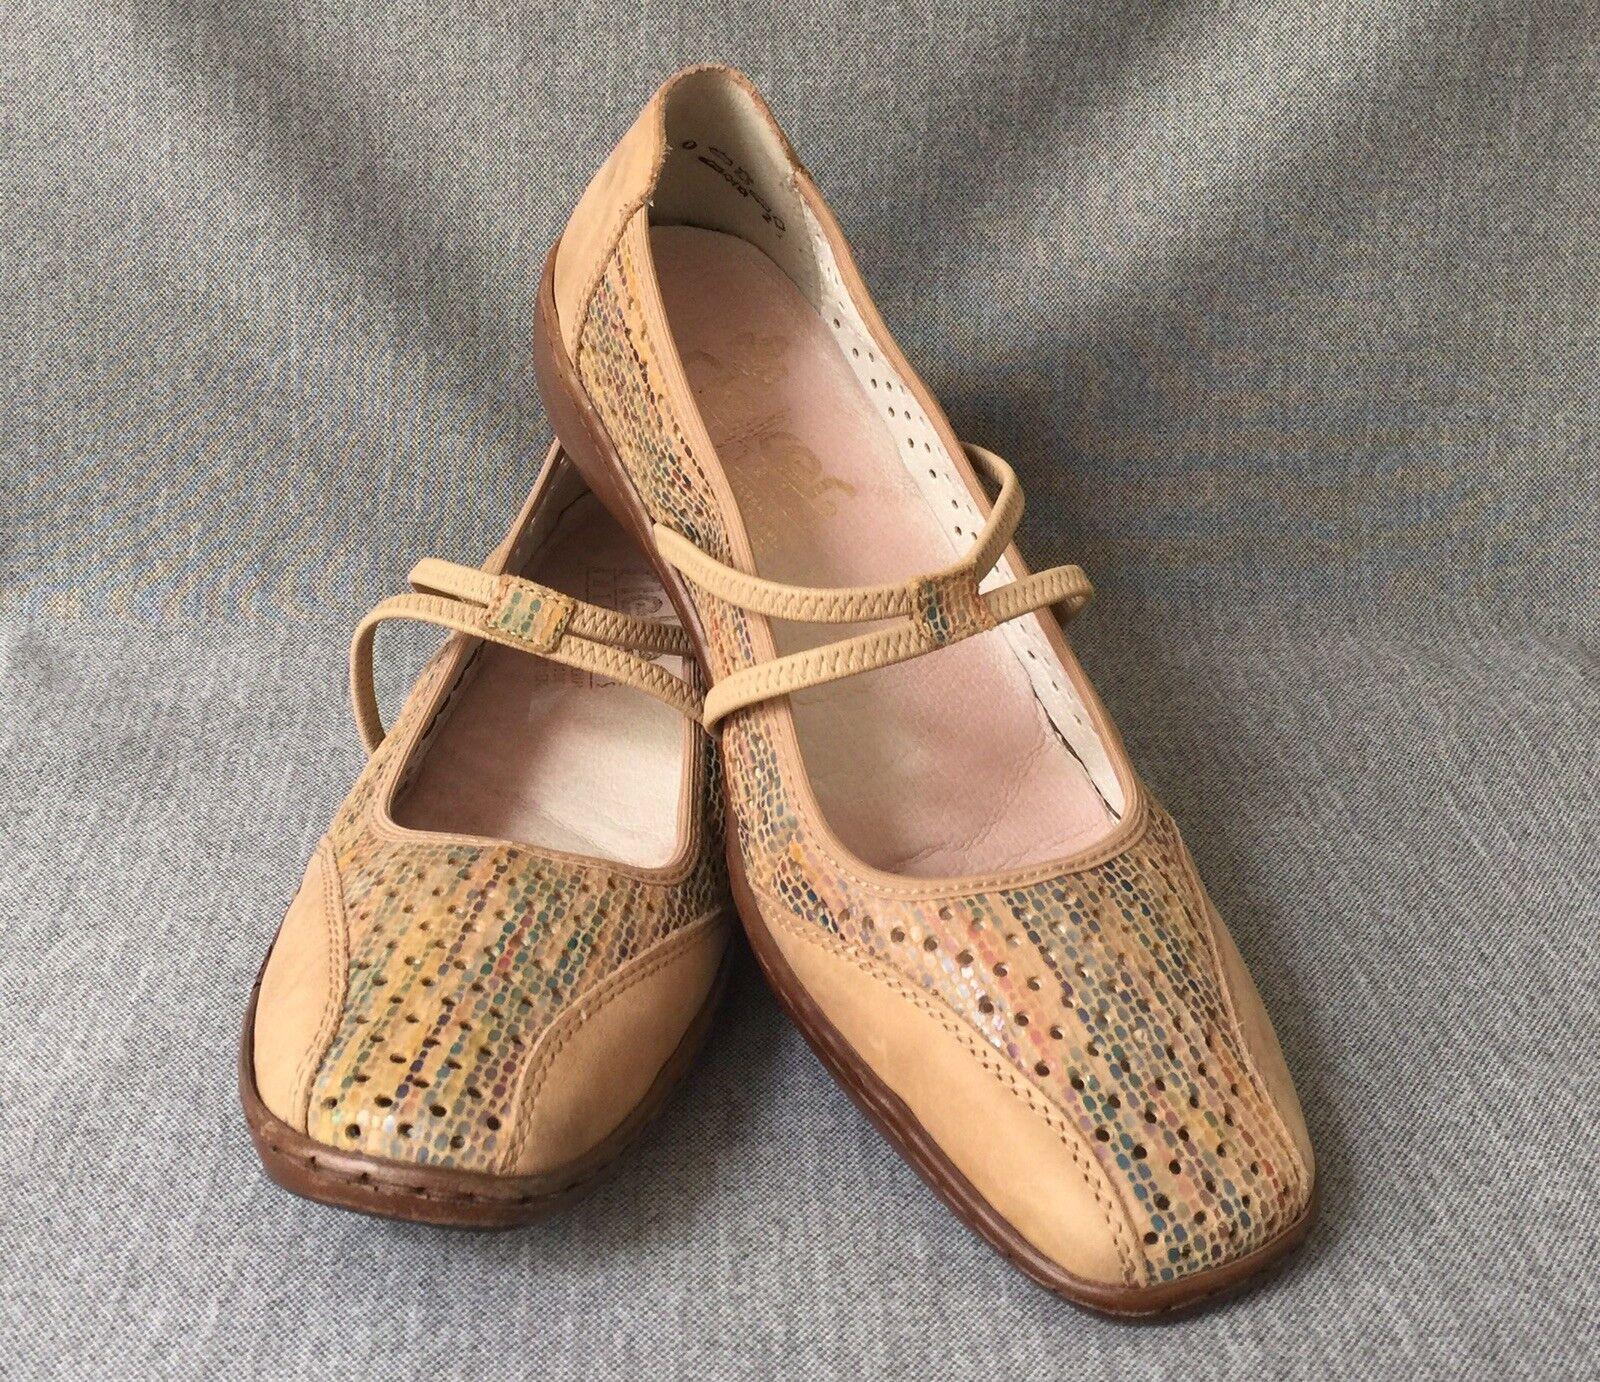 Rieker Anti-Stress TAN Comfort  shoes Flats Womens shoes EUR 41  9.5 US